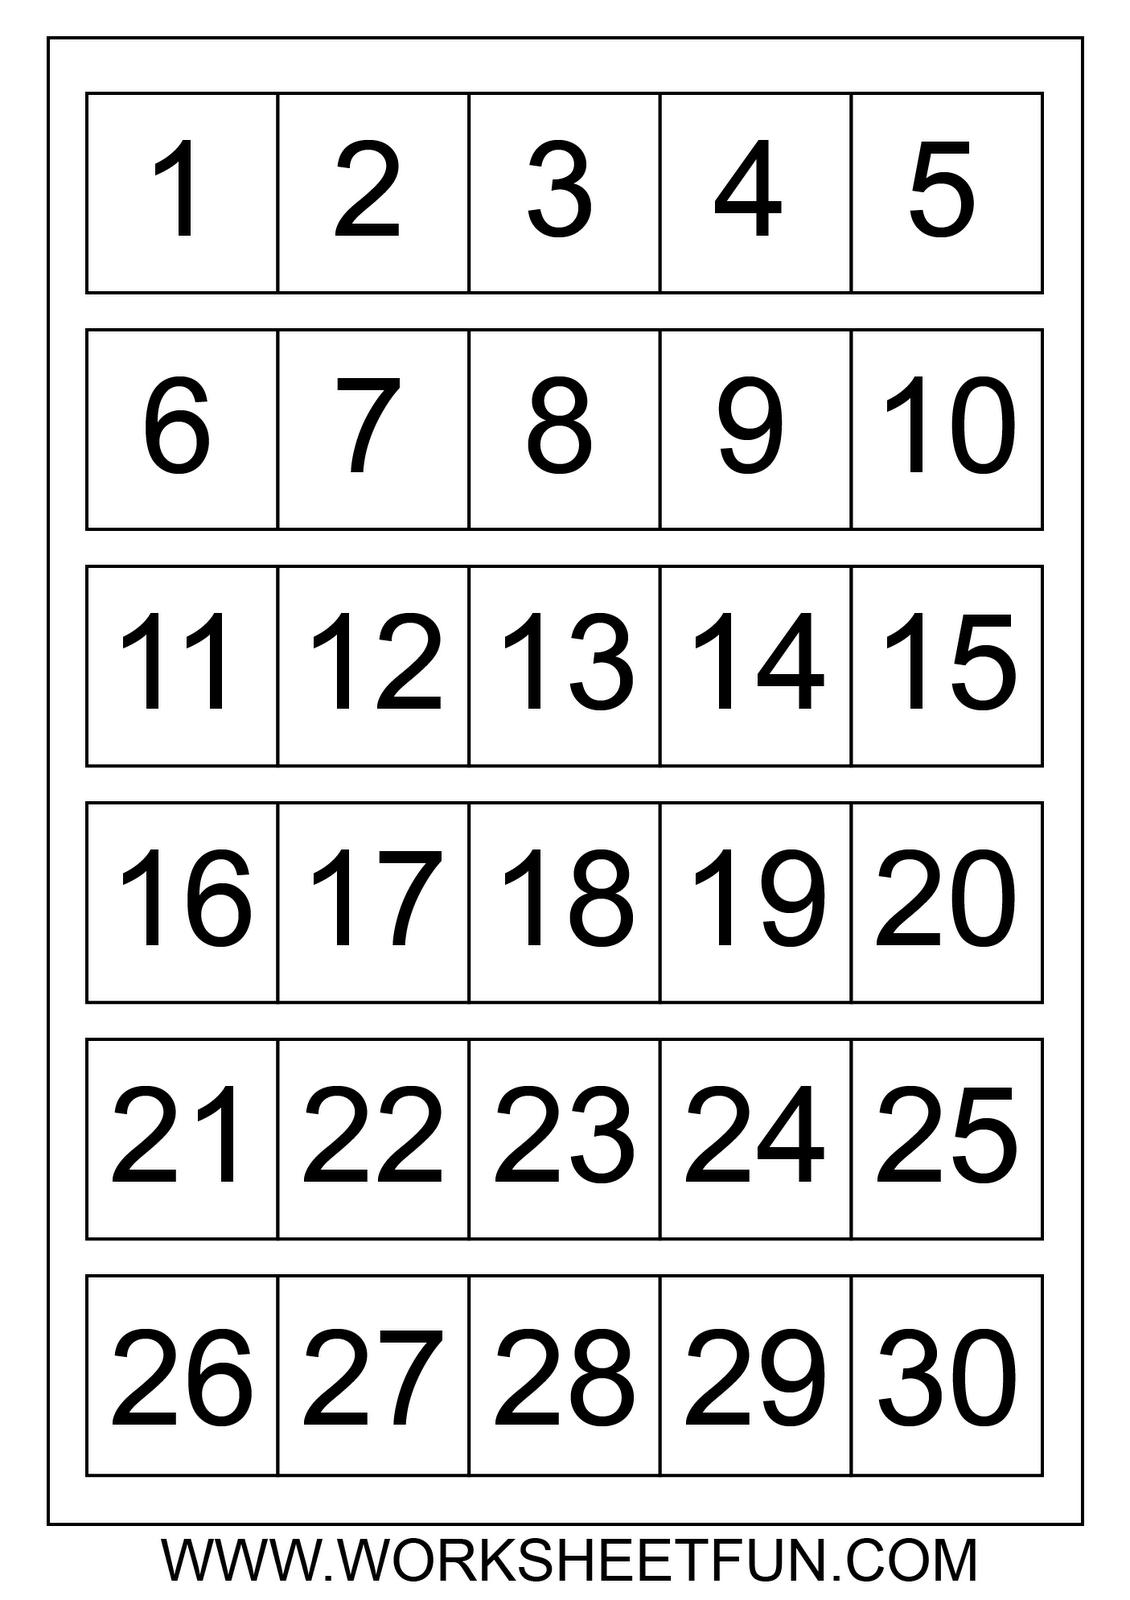 Free Printable Calendar Numbers 1-31 Pdf | Ten Free Calendar Numbers Printable 1-31